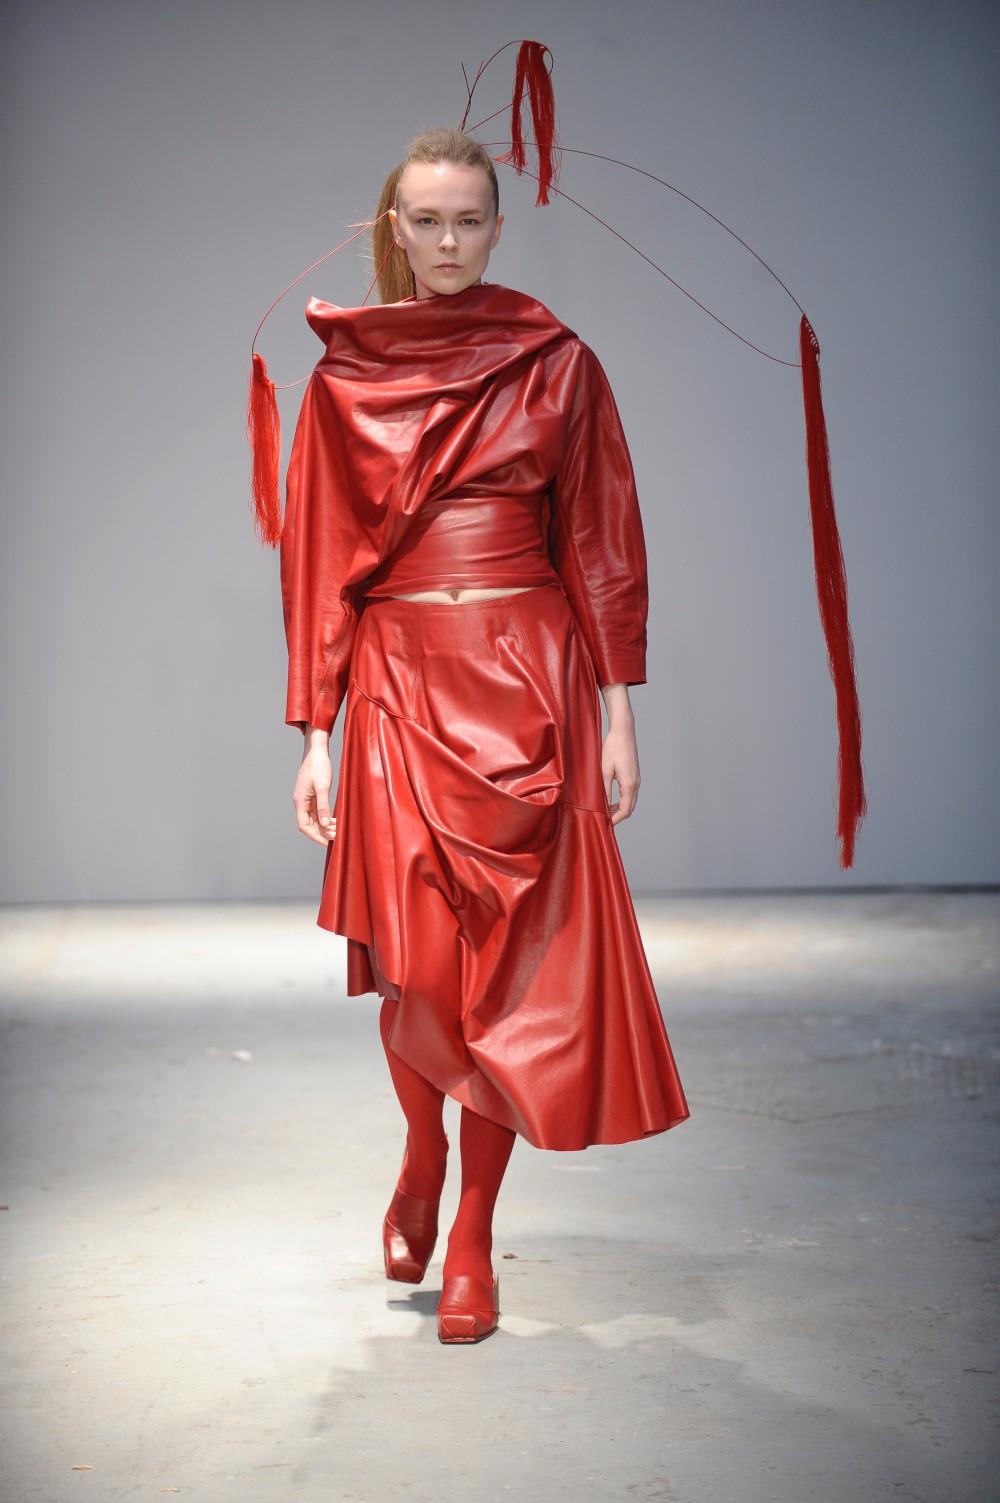 Womenswear by Hanni Yang, footwear by Qingqing Yu and head piece by Shaila Irfan. Photo credit: Roger Dean